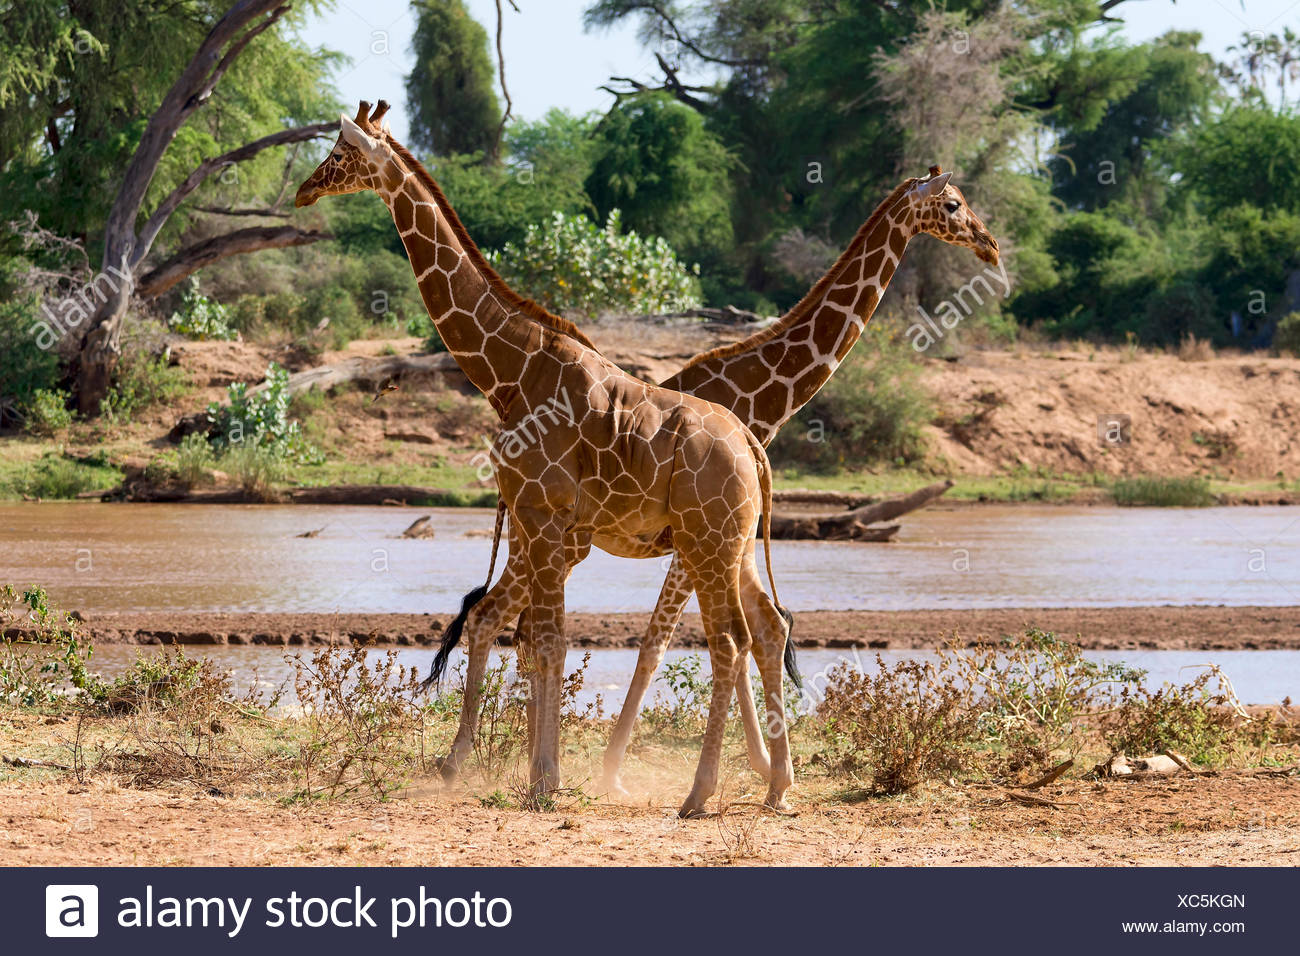 Les Girafes réticulée ou Somali girafes (Giraffa camelopardalis reticulata) par la rivière, la réserve nationale de Samburu, Kenya Banque D'Images